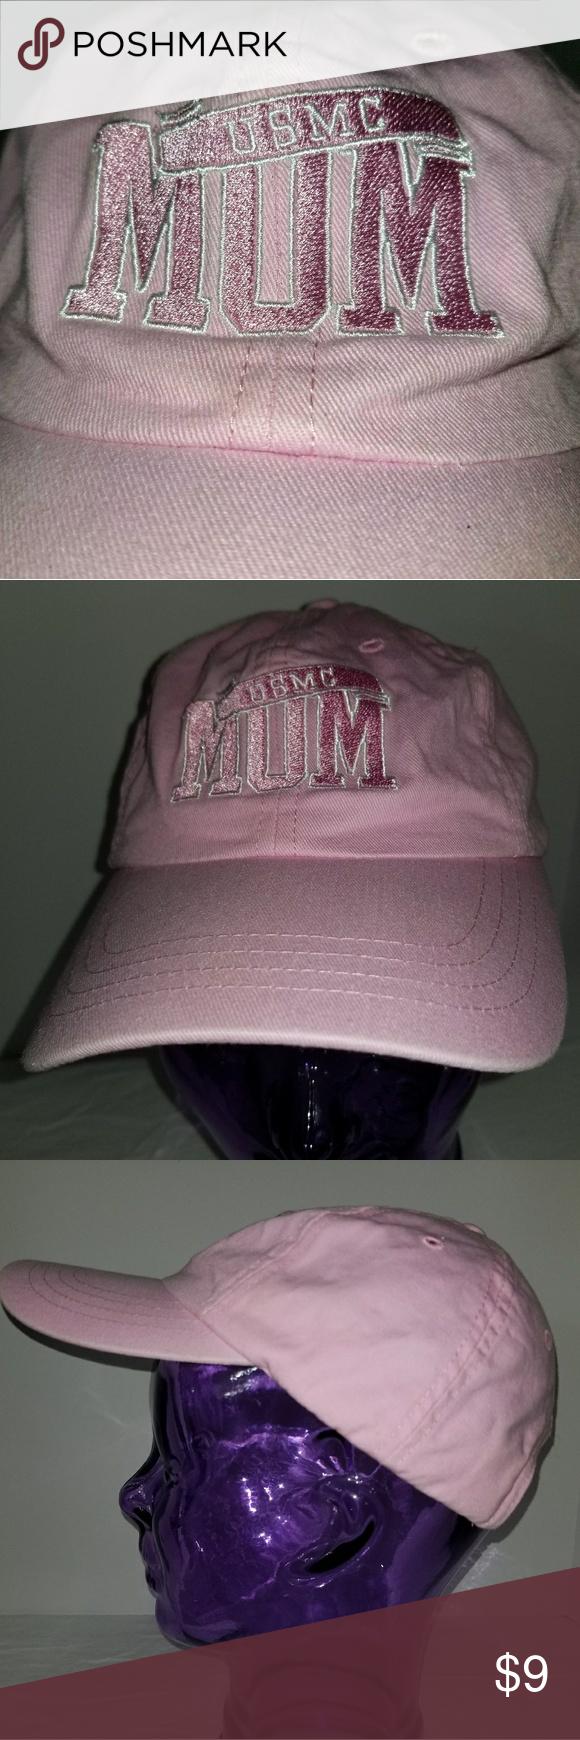 71835c37d1c USMC Mom baseball cap Pink USMC MOM embroidered on the front